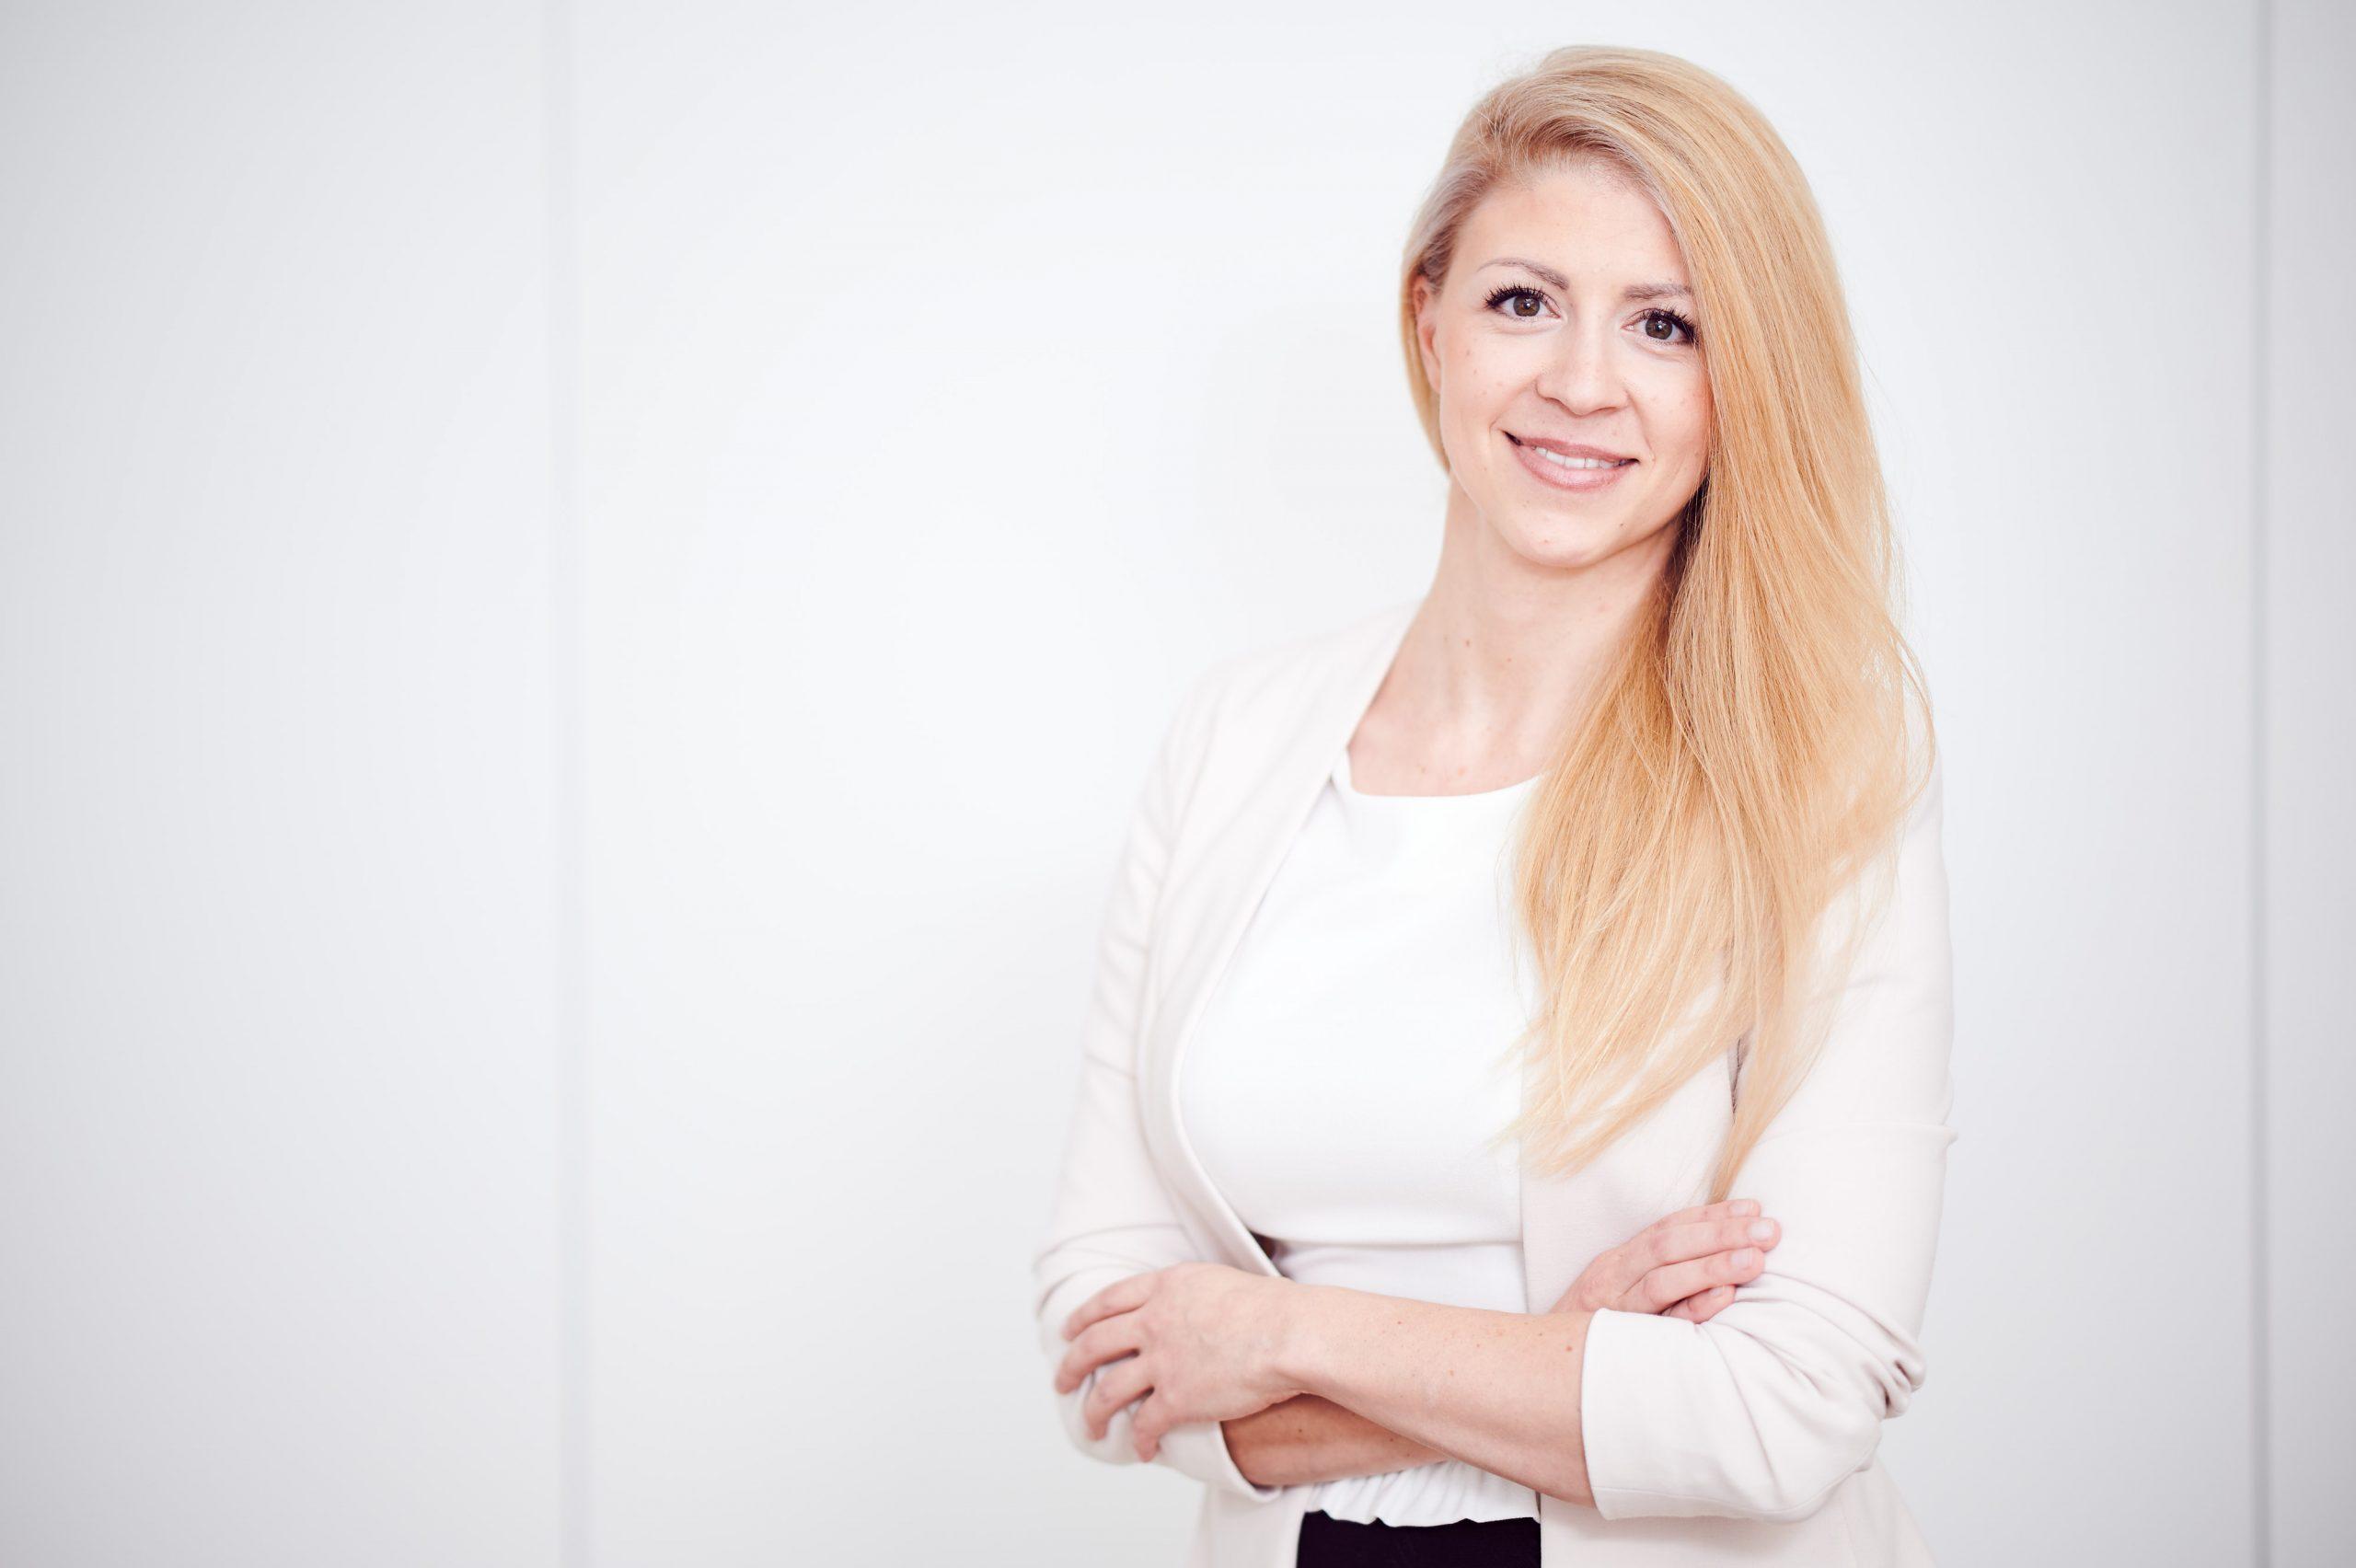 Mag. (FH) Julia Prachleitner